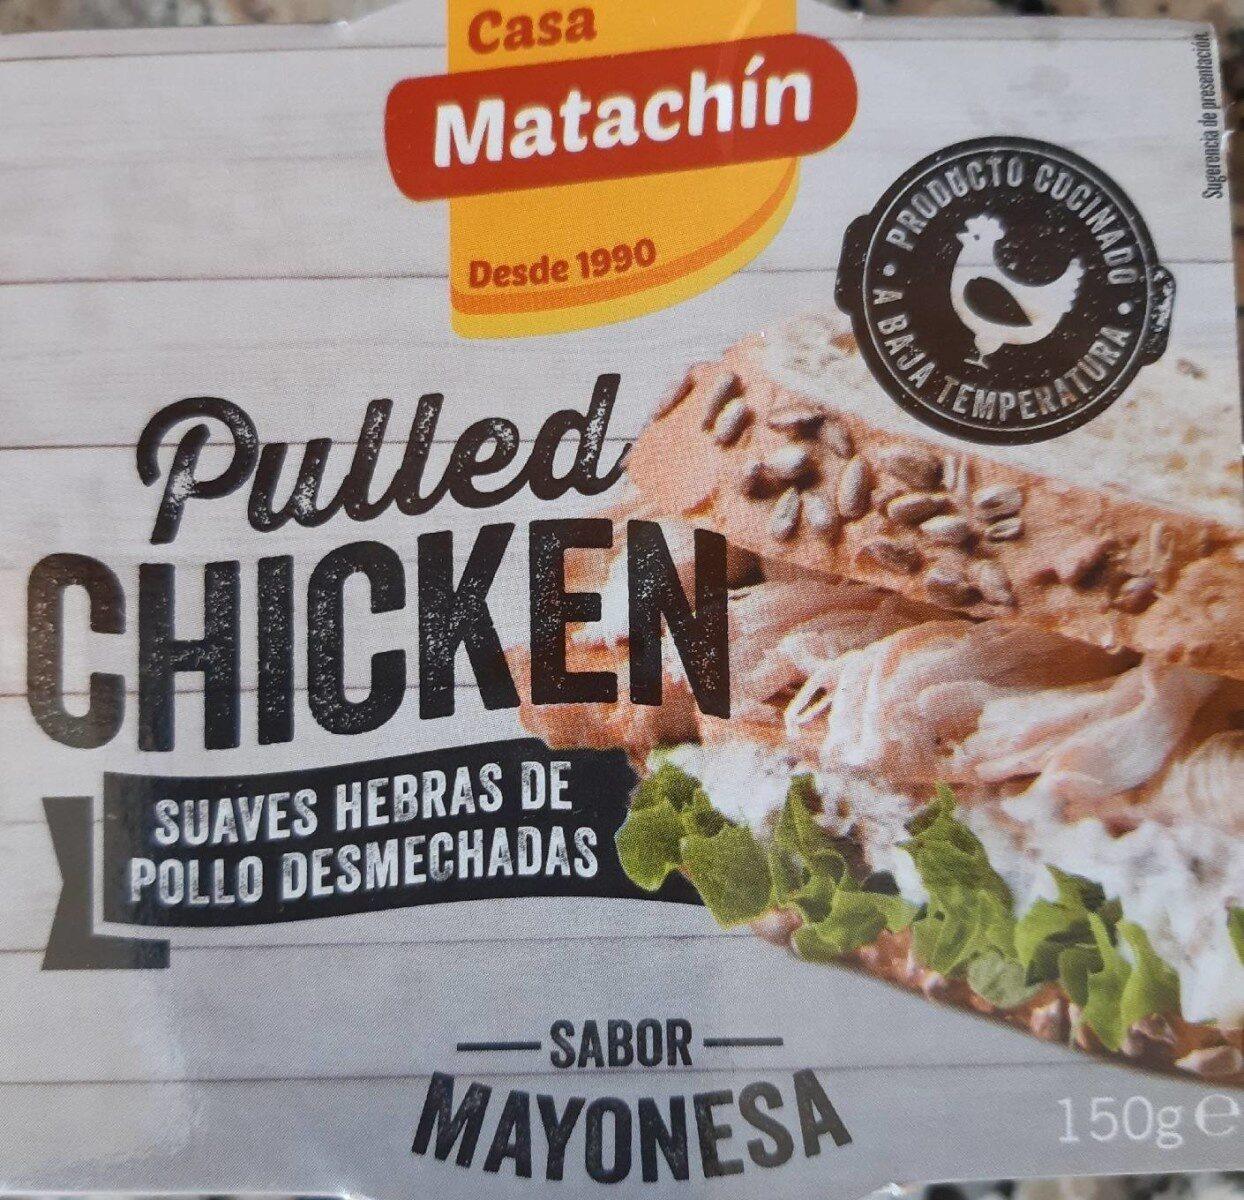 Pilles chicken- suaves hebras de pollo desmechadas - Product